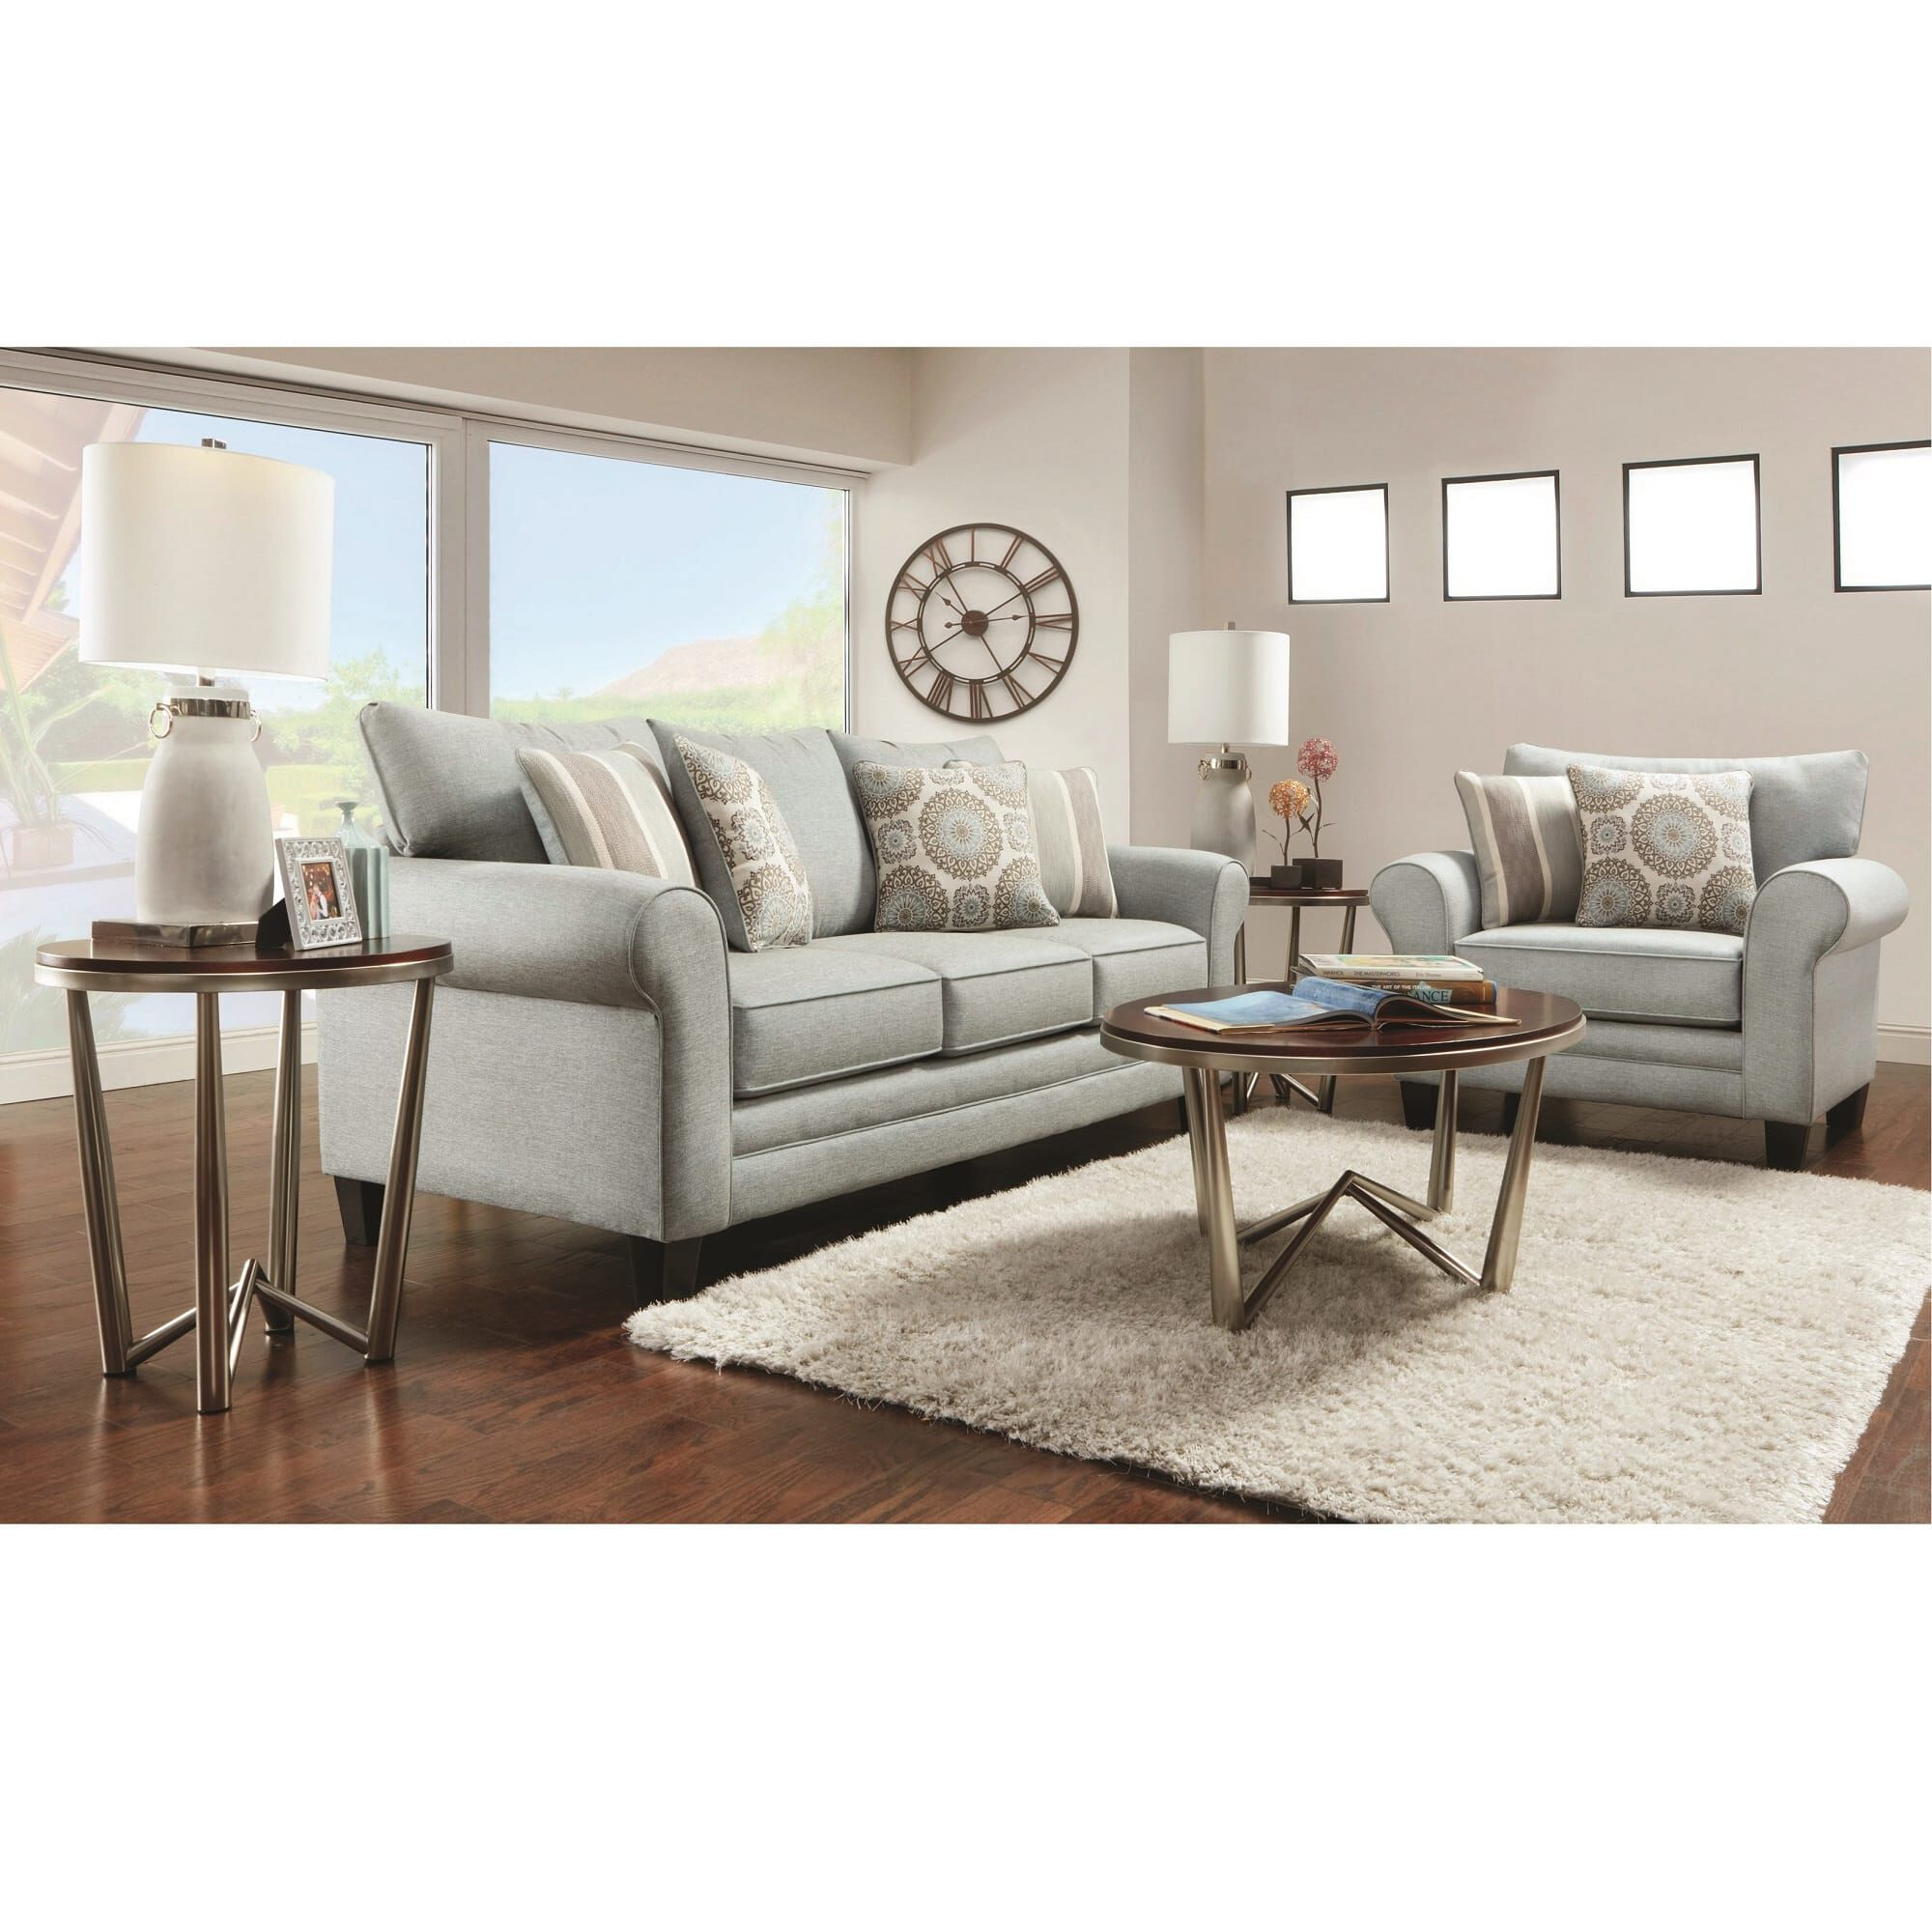 Fusion Furniture Living Room Sets 2Piece Lara Living Room